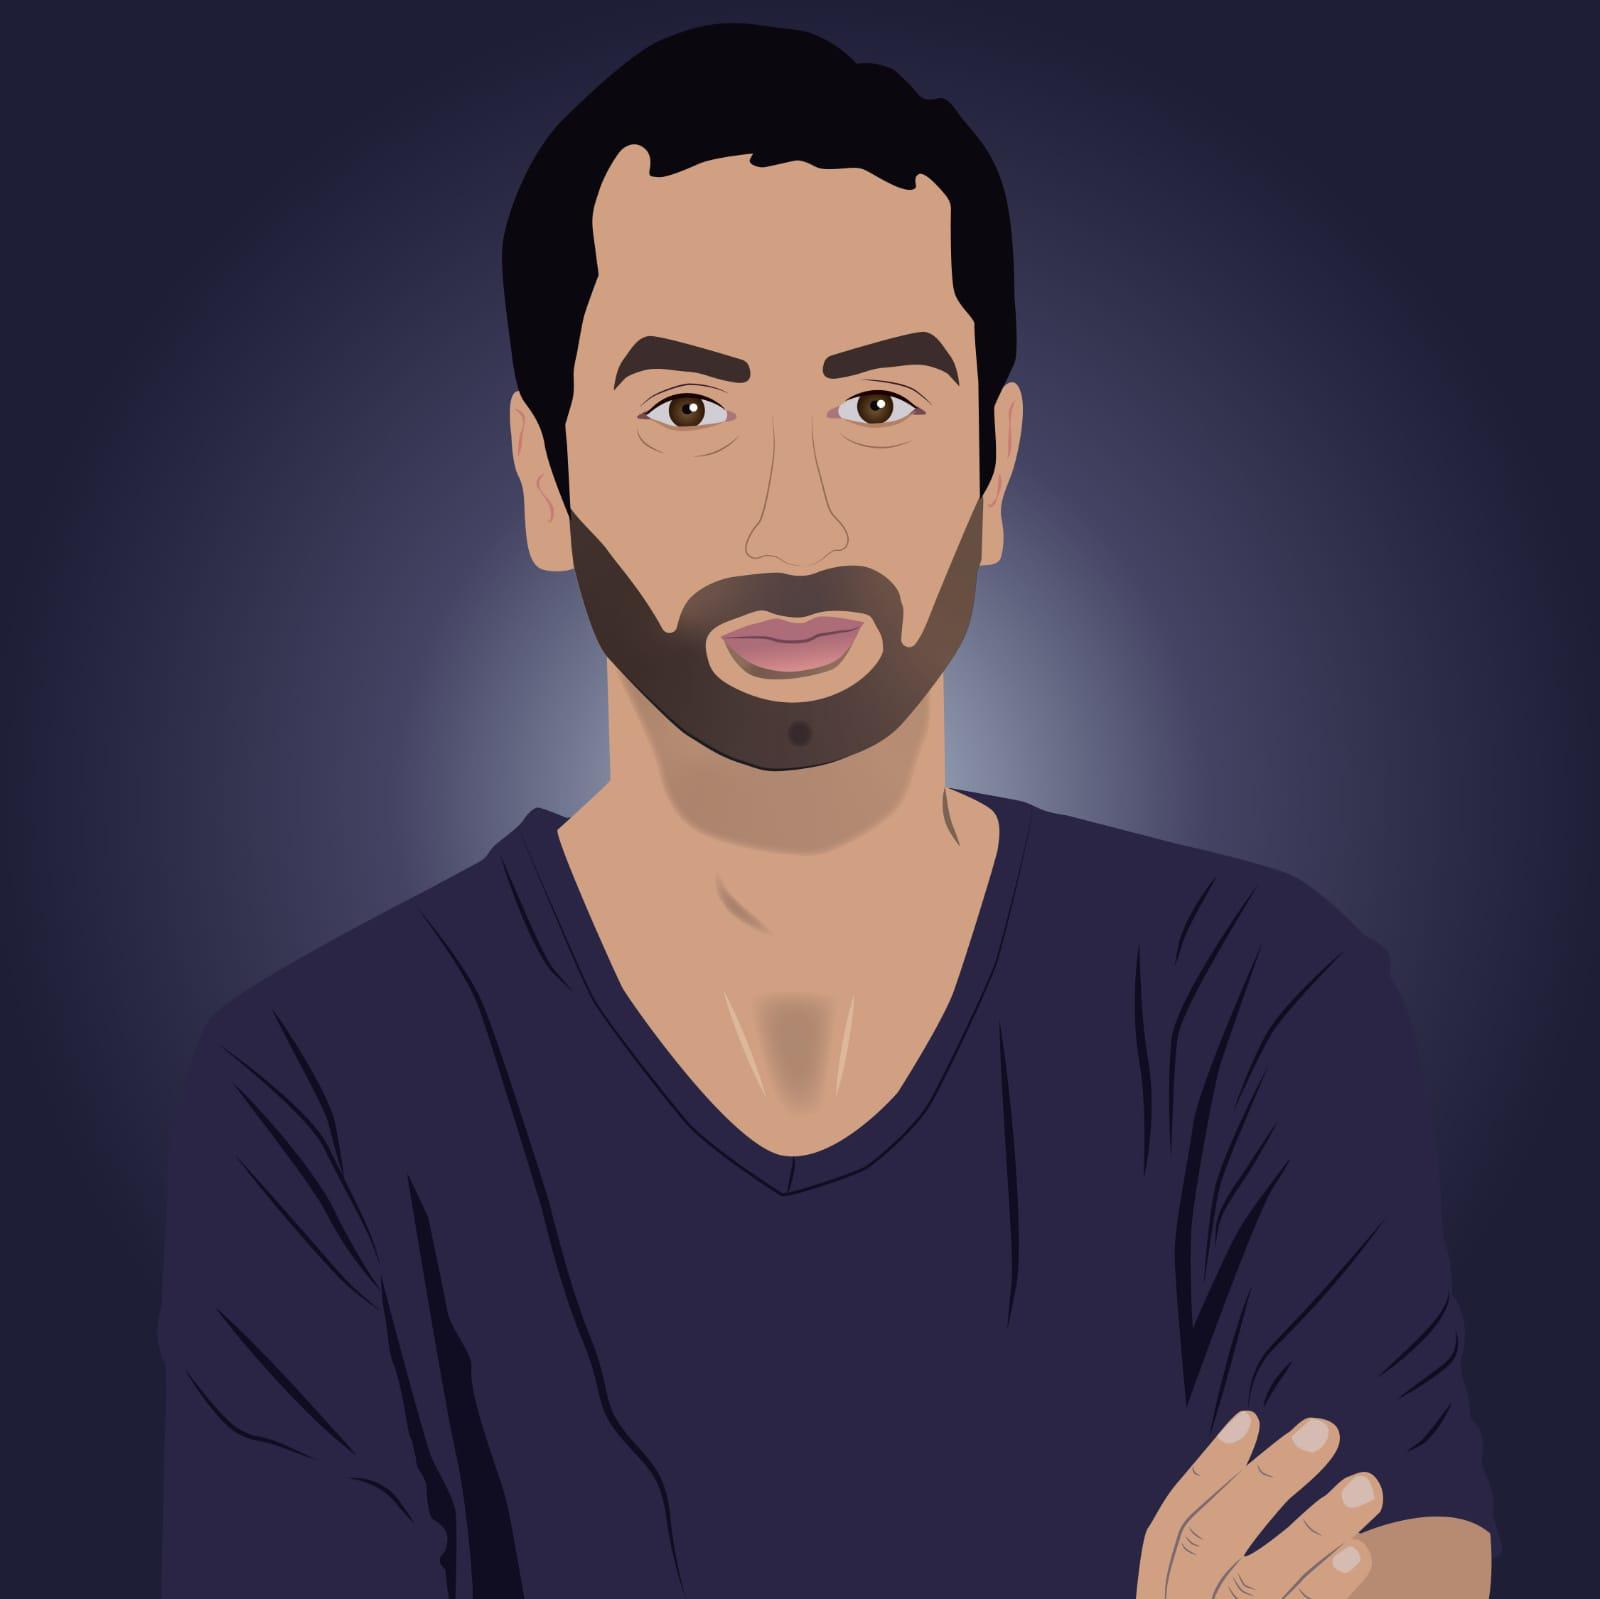 "<a href=""https://www.facebook.com/elad.yerushalmi"" target=""_blank""><img src="